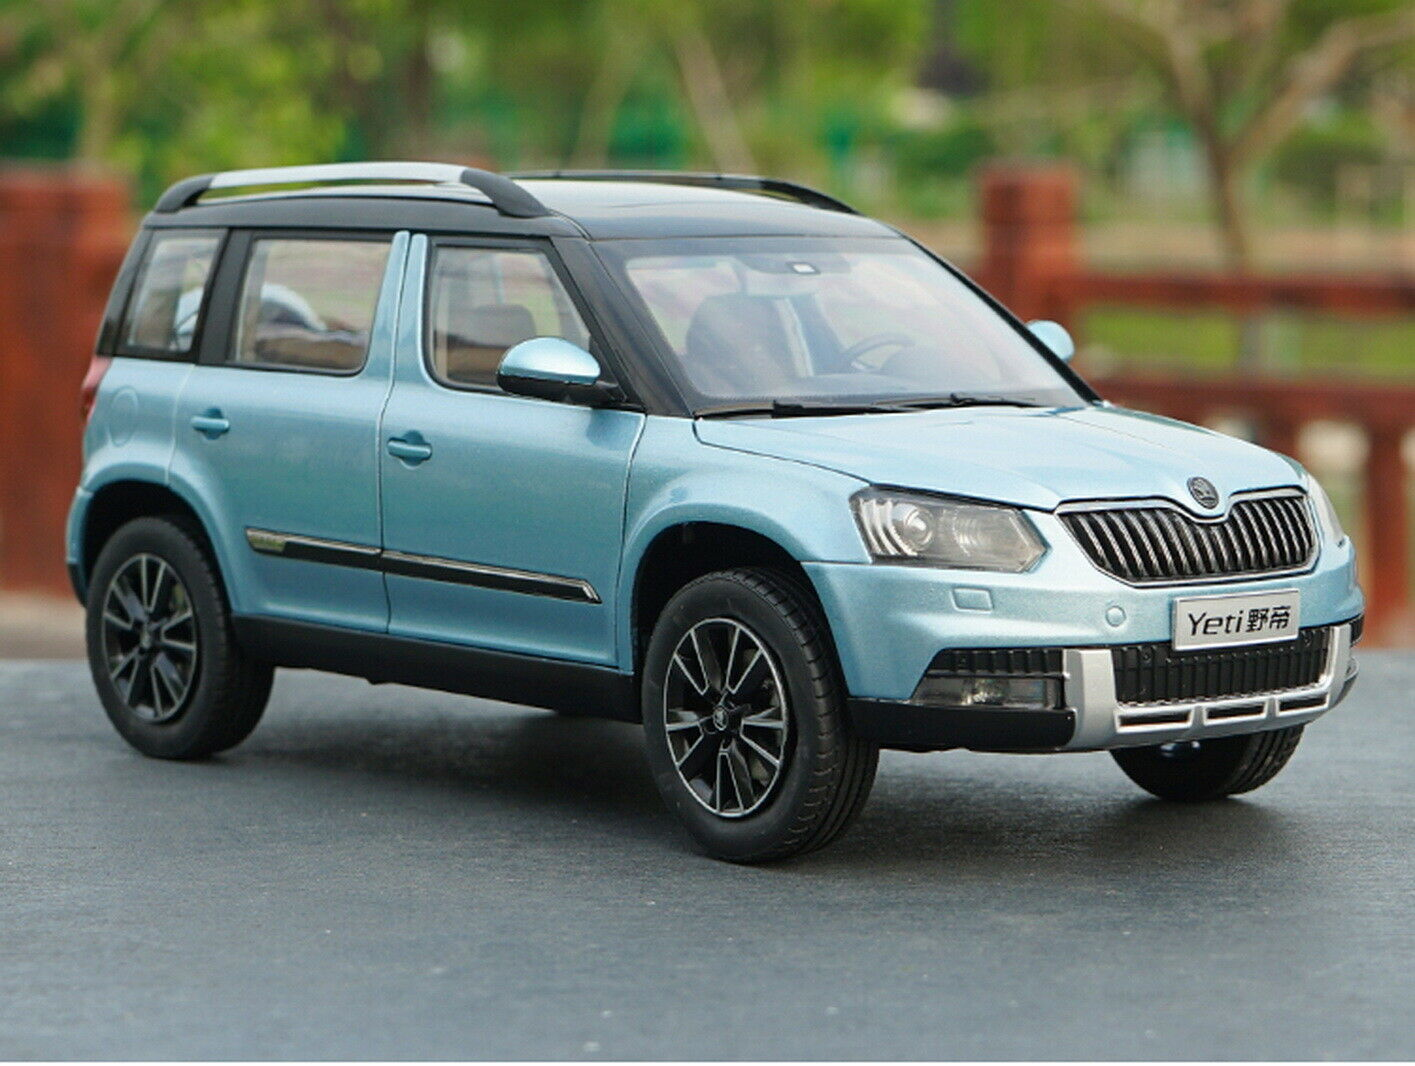 1 18 SCALA VW Volkswagen Skoda Yeti Suv Blu Diecast Auto Modello Collection